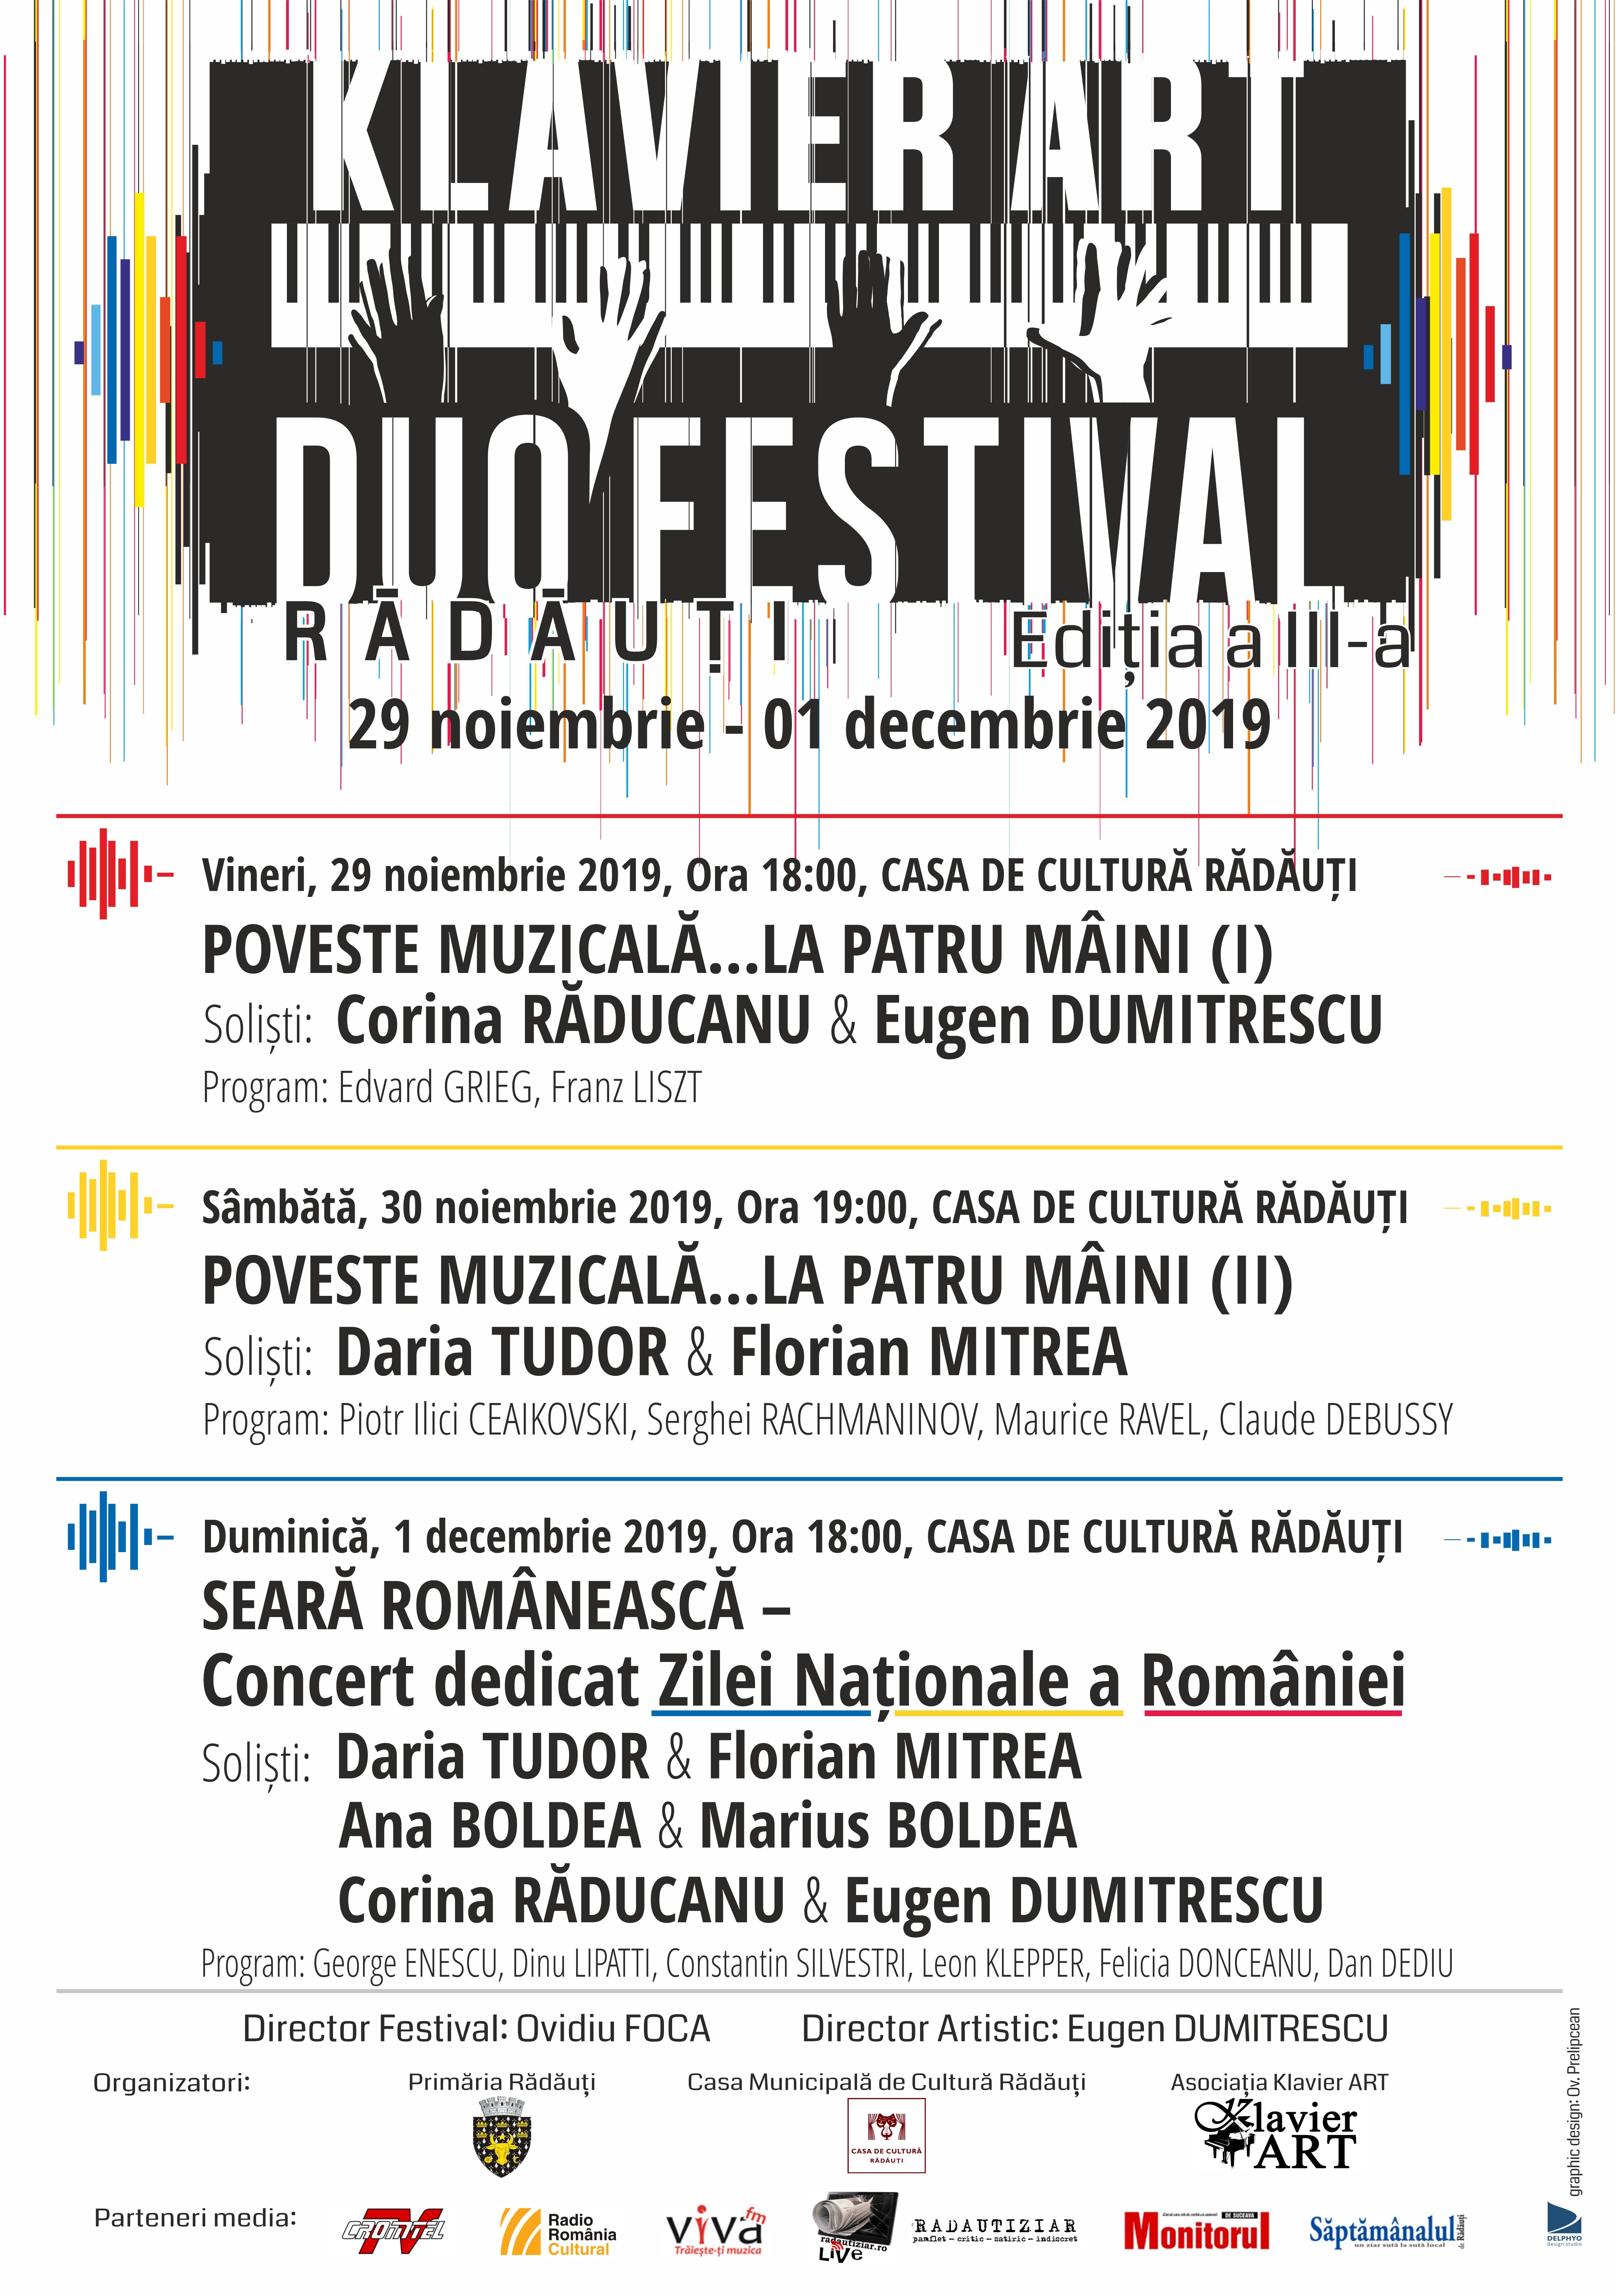 Afis--KLAVIER-ART-Duo-Festival-CC-Radauti--nov2019--edit-02Final-A (1)